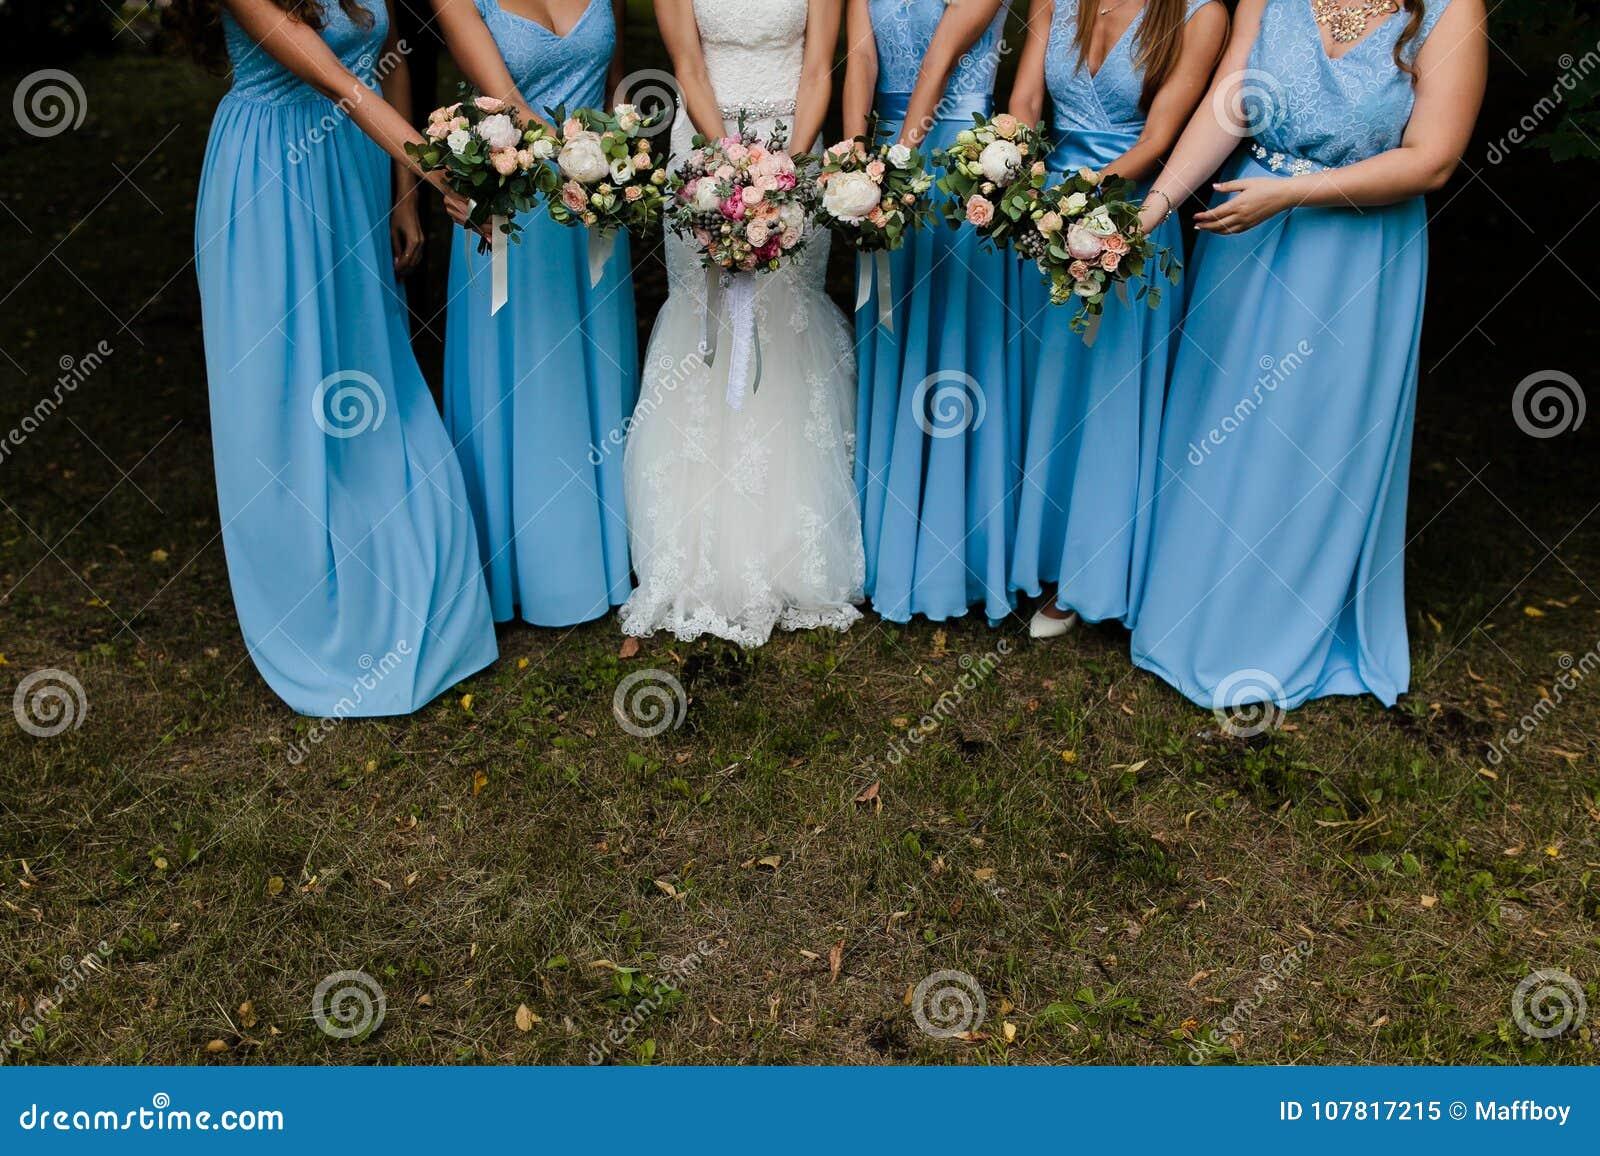 Bridesmaids in blue